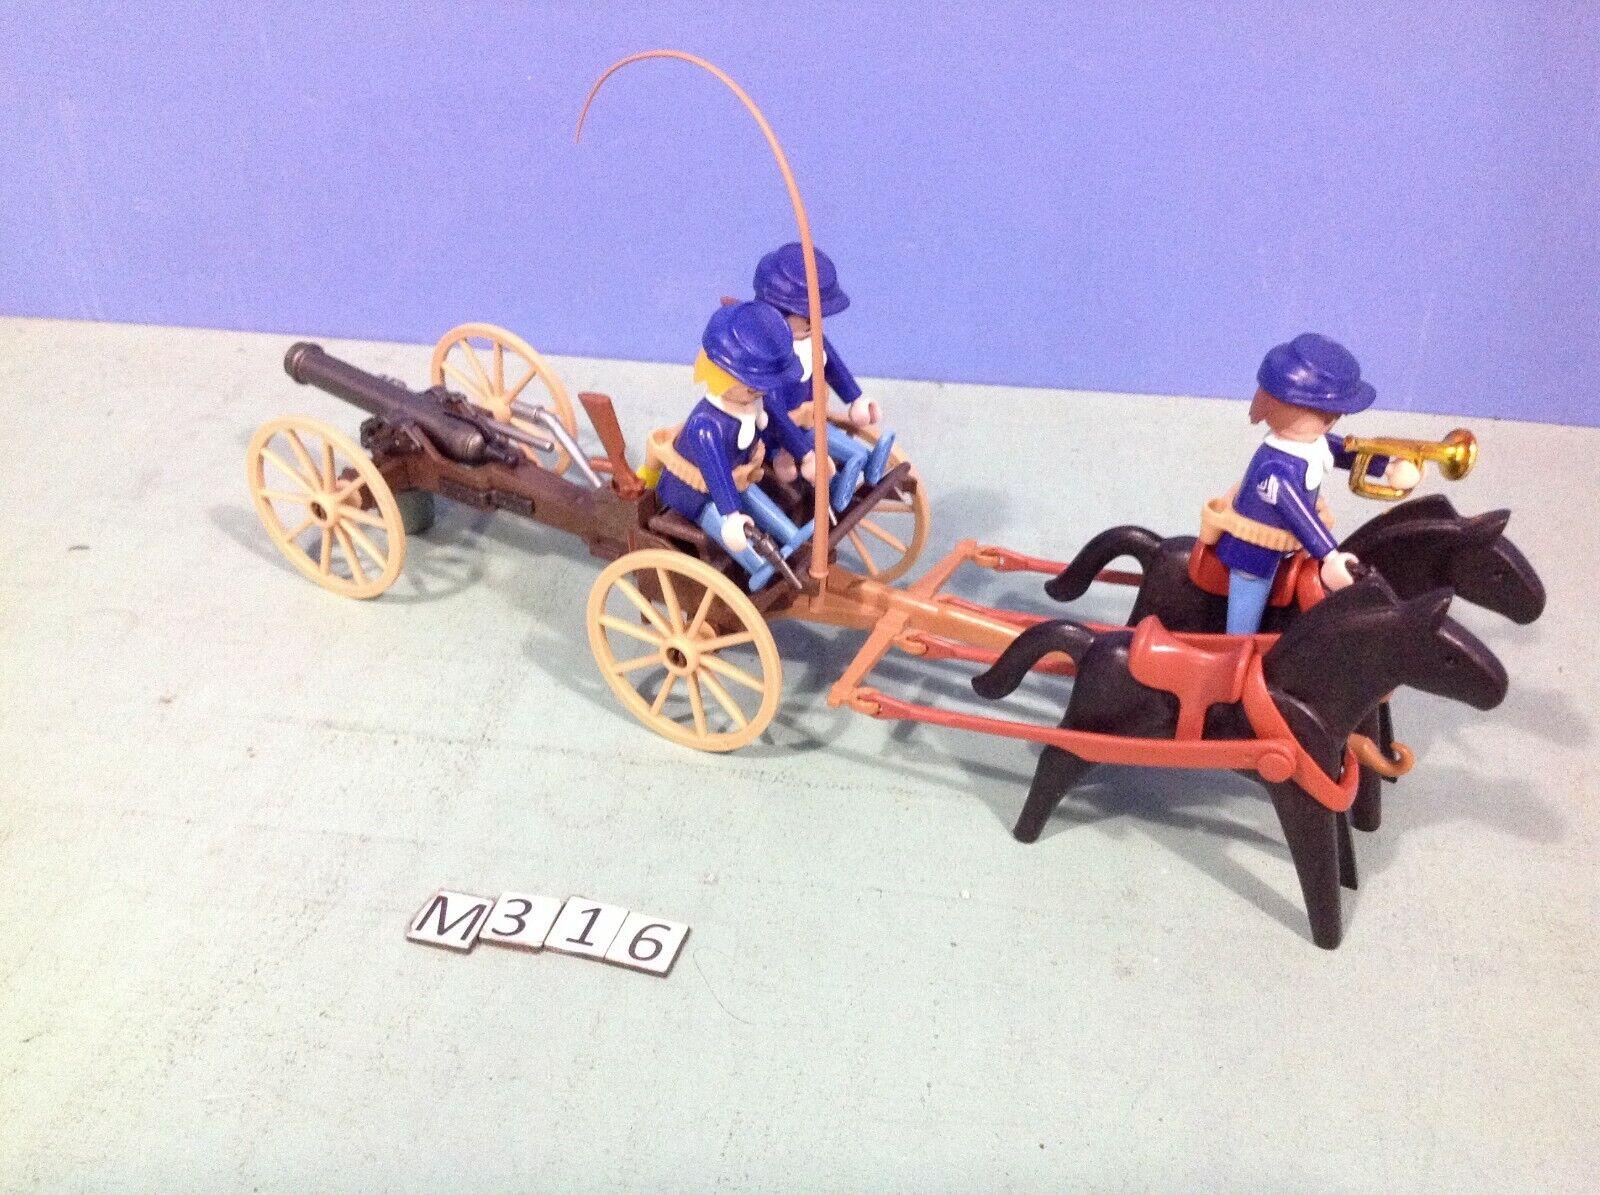 (M316) playmobil Chariot canon Nordistes ref 3729 western Sudistes 3806 5245